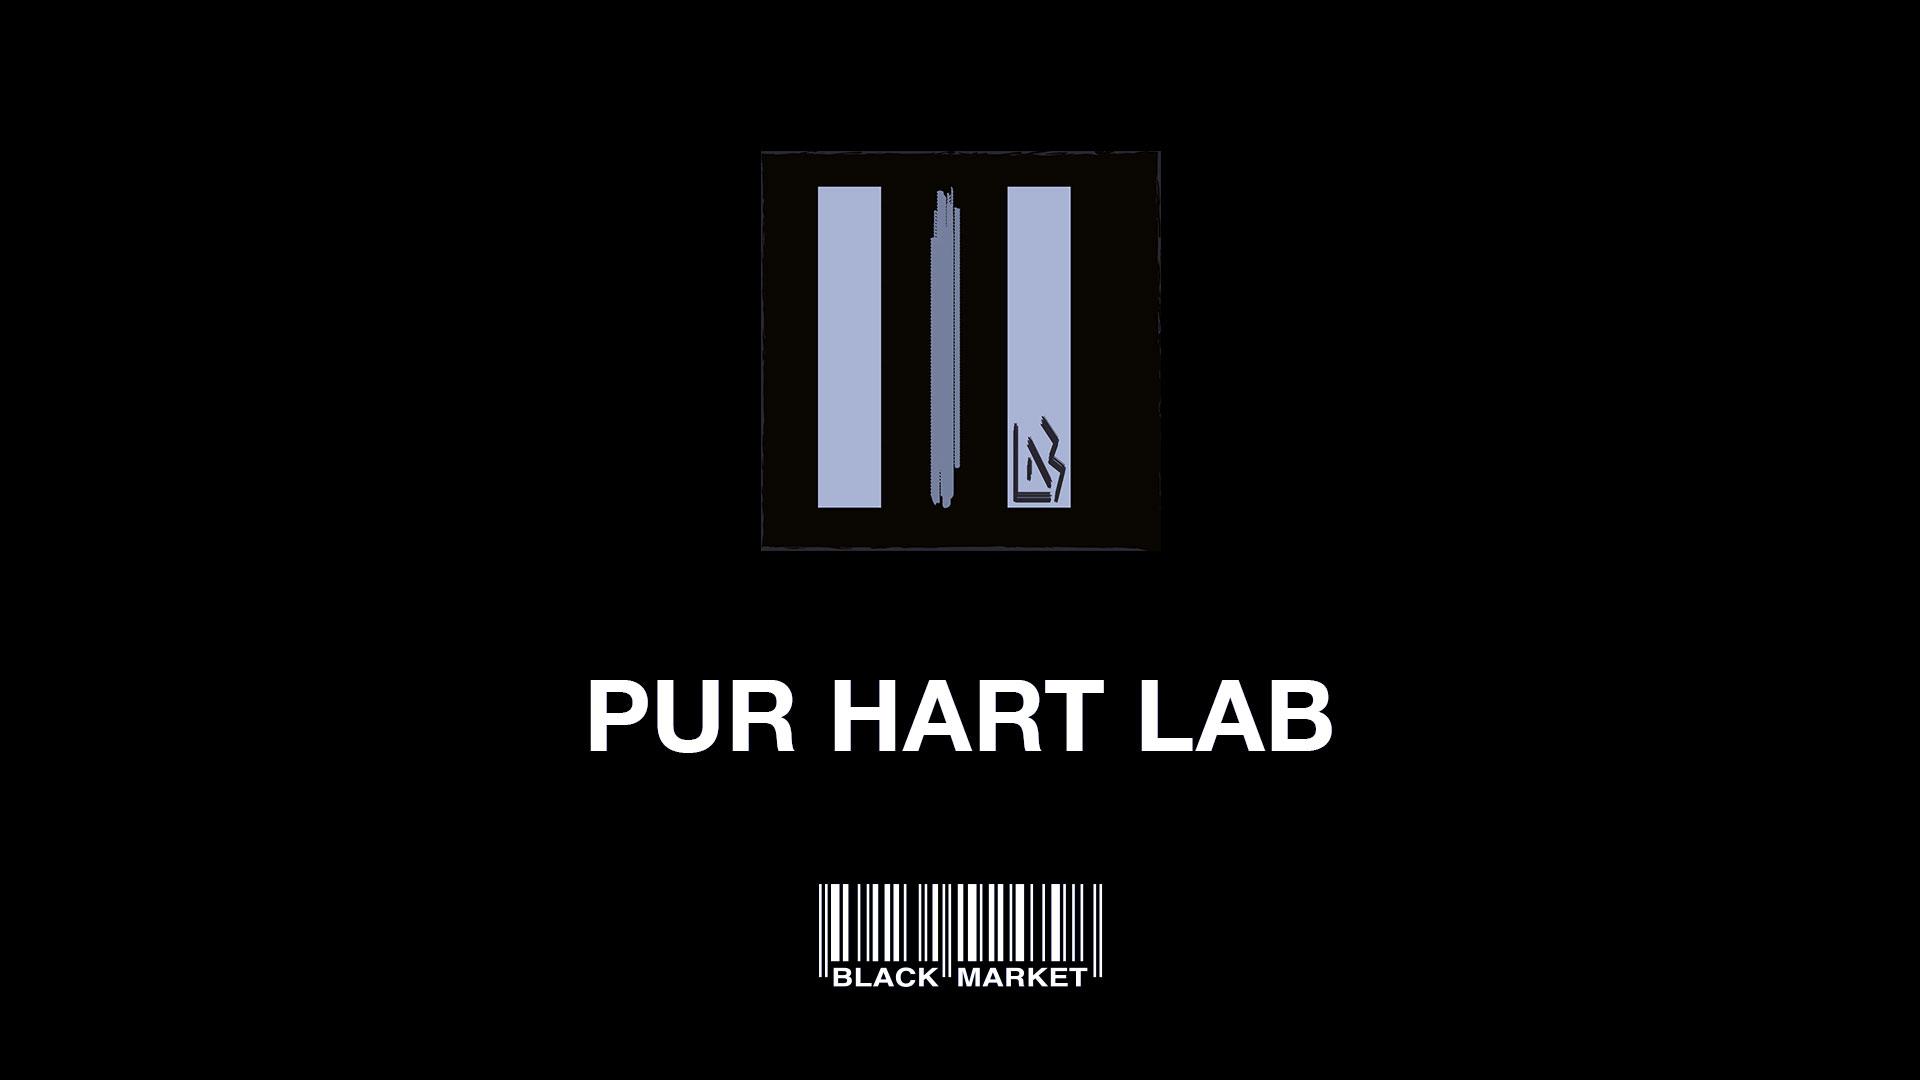 PUR Hart Lab am 13. March 2020 @ Black Market.